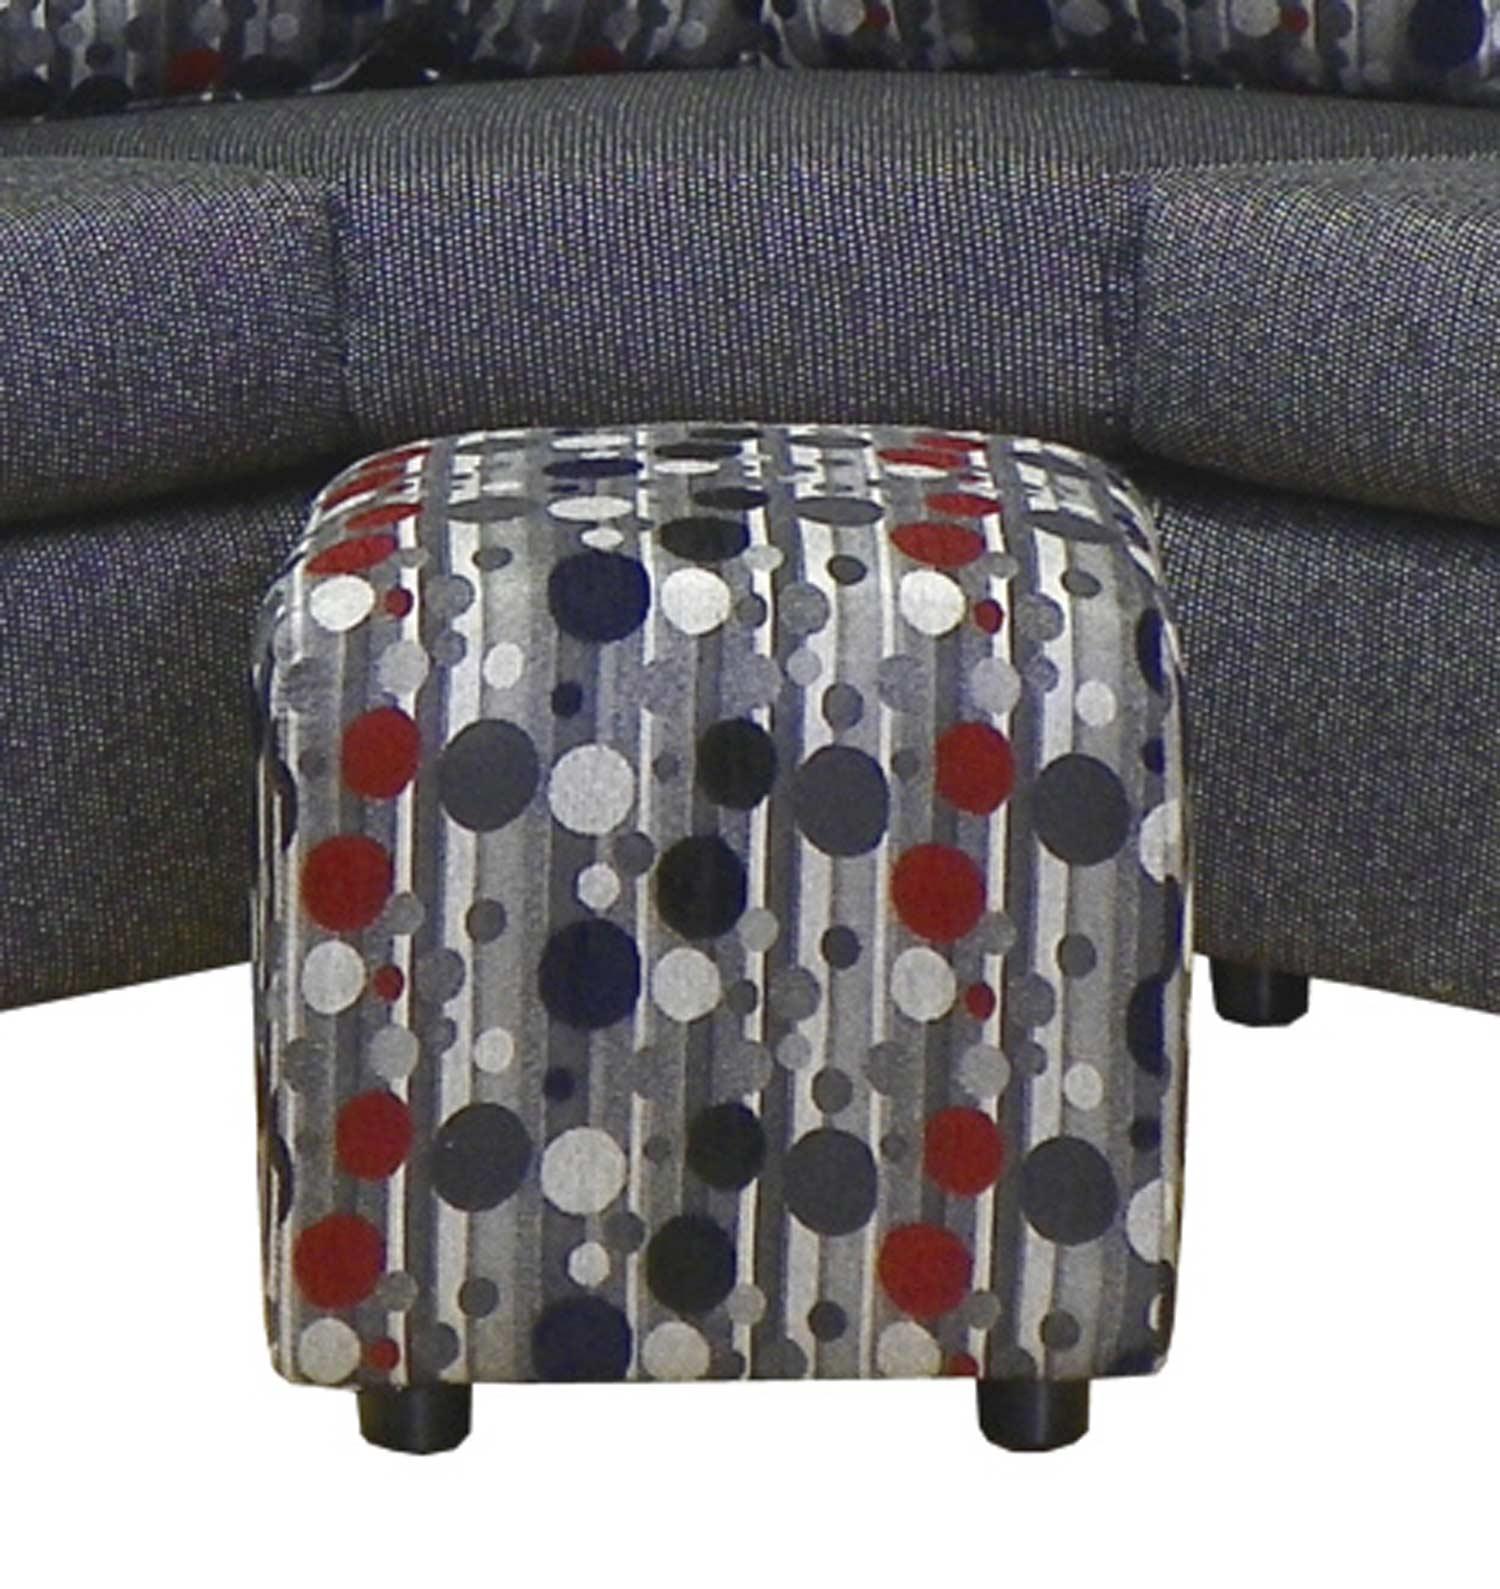 Chelsea Home Furniture Dawn Ottoman - Kazoodle Carnival 23295-O-KC